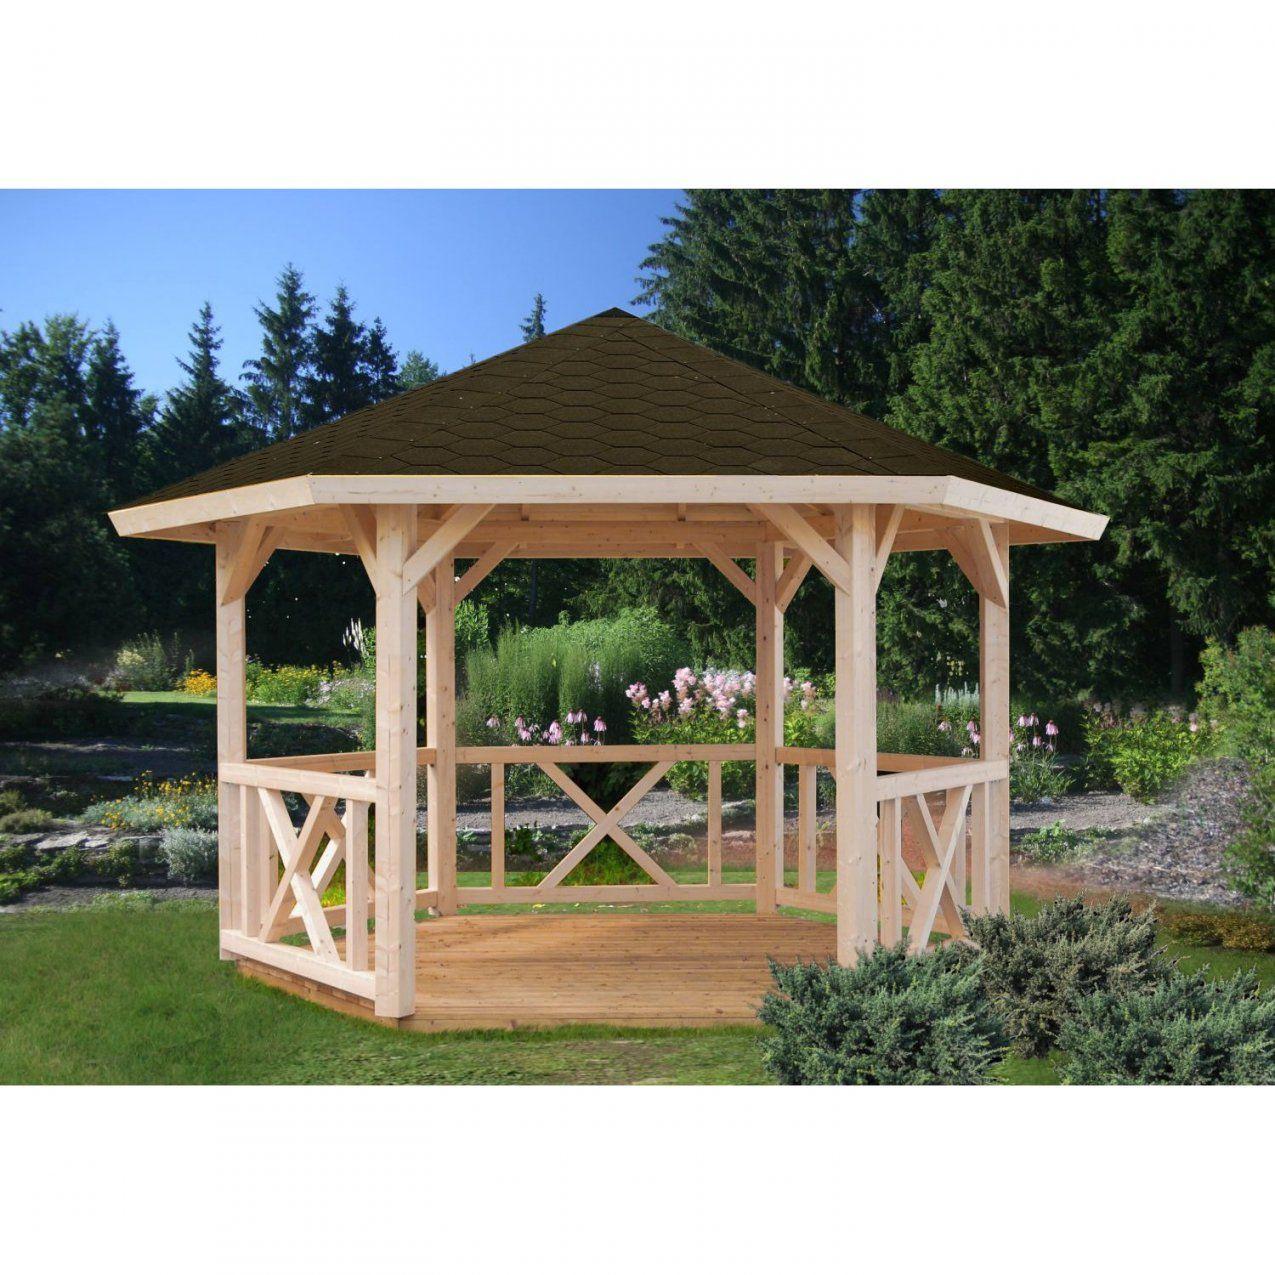 Palmako Holzpavillon Betty Sechseckig Kaufen Bei Obi von Pavillon 6 Eckig Holz Bild